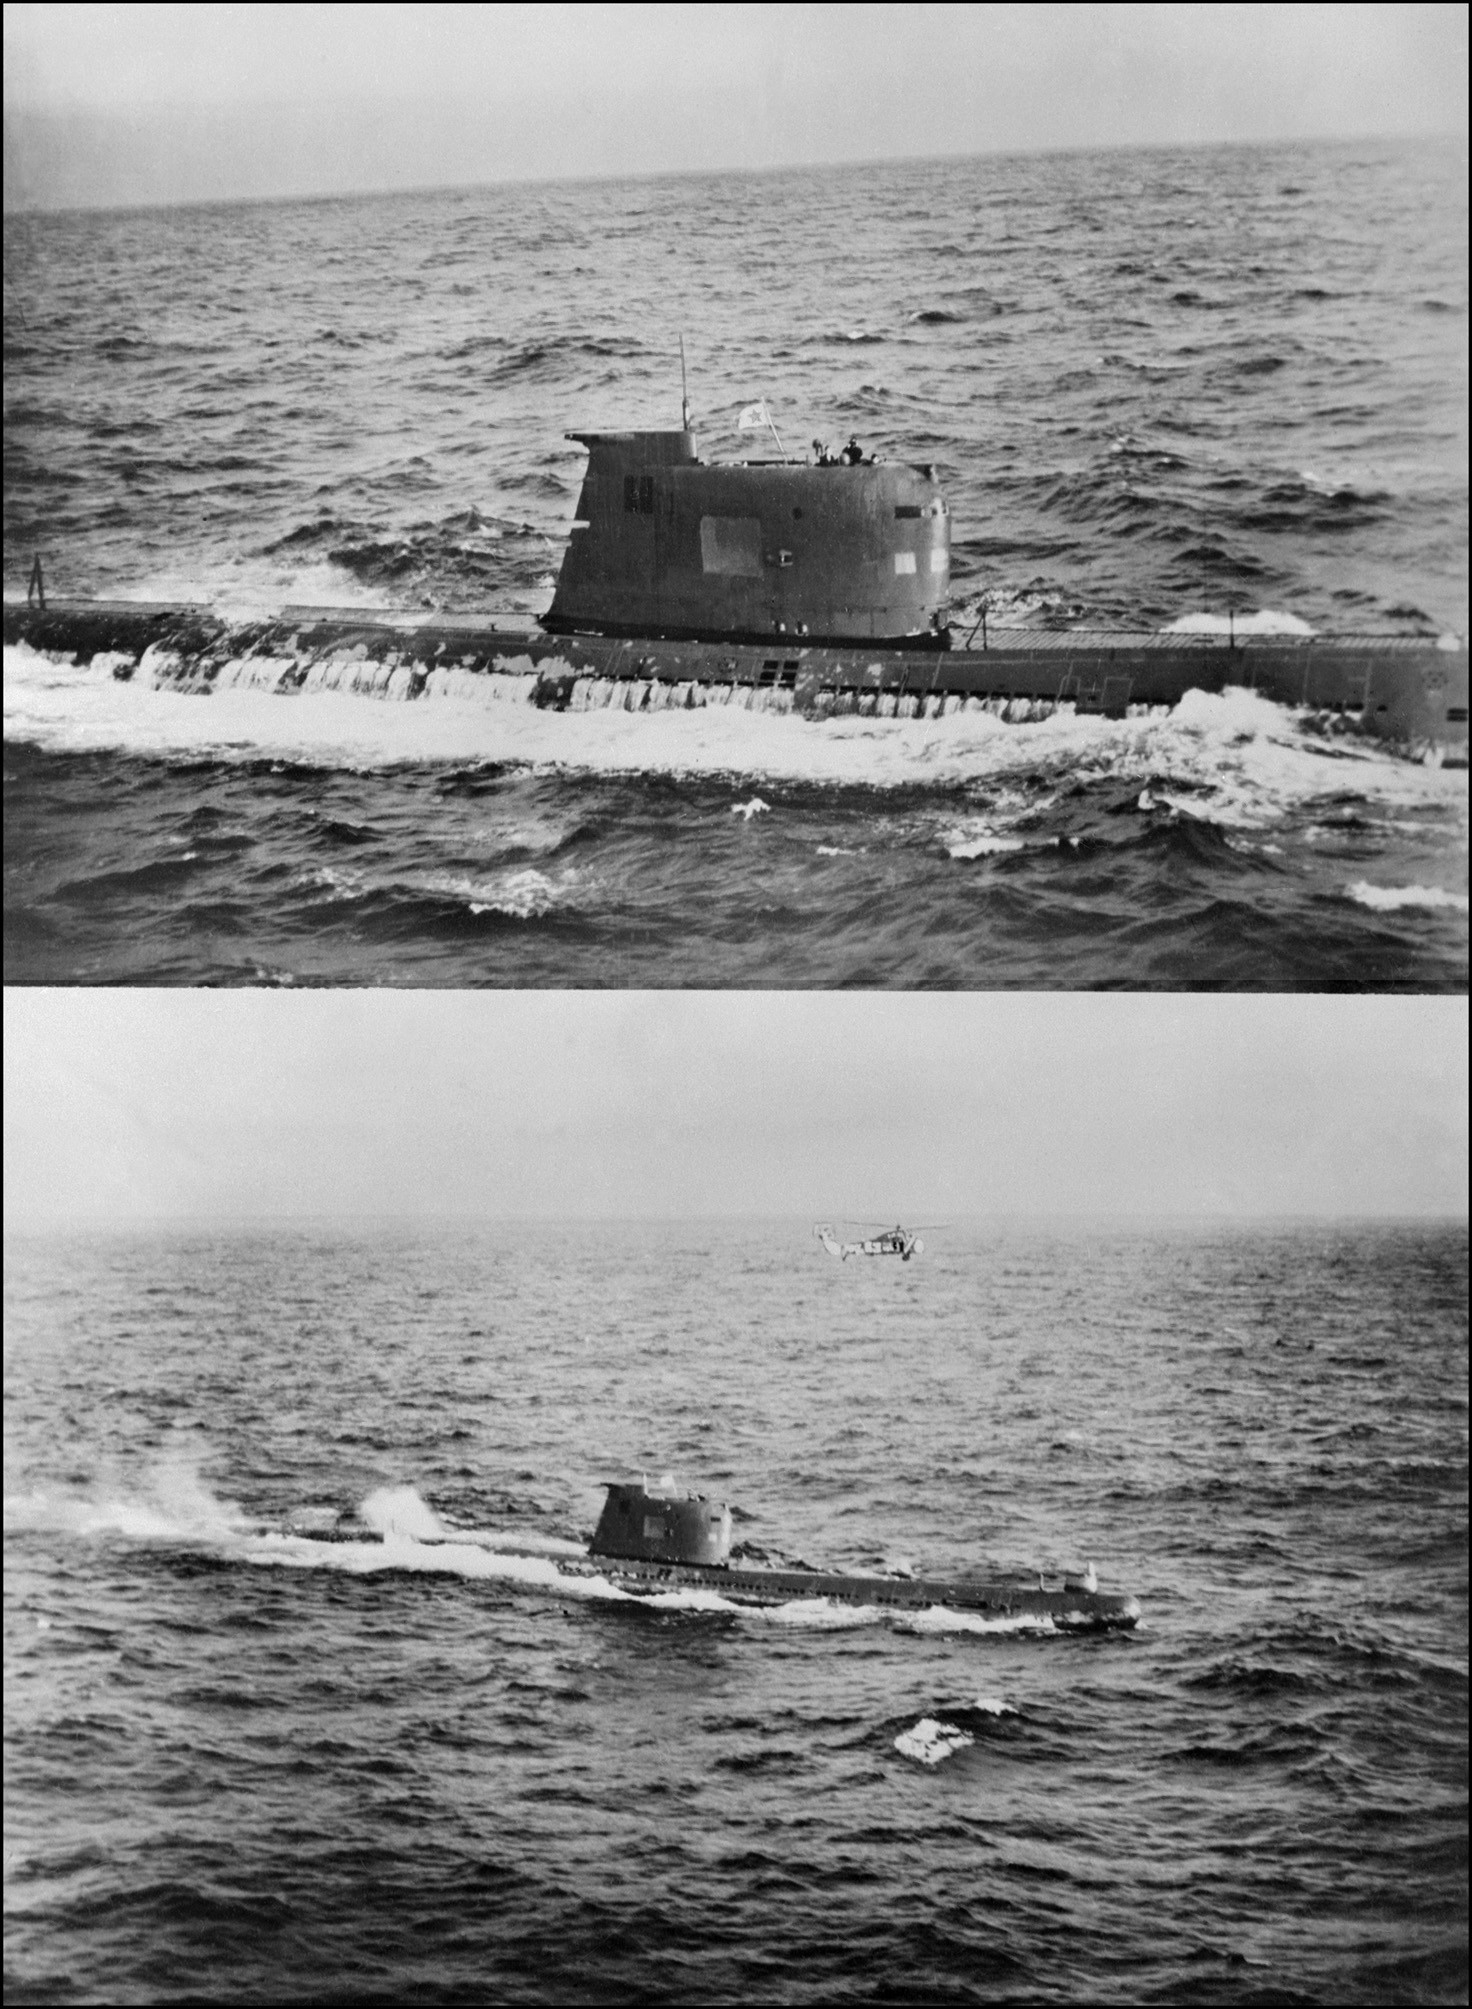 Un submarino soviético situado cerca de la costa controla la retirada de misiles soviéticos de Cuba, 10 de noviembre de 1962.